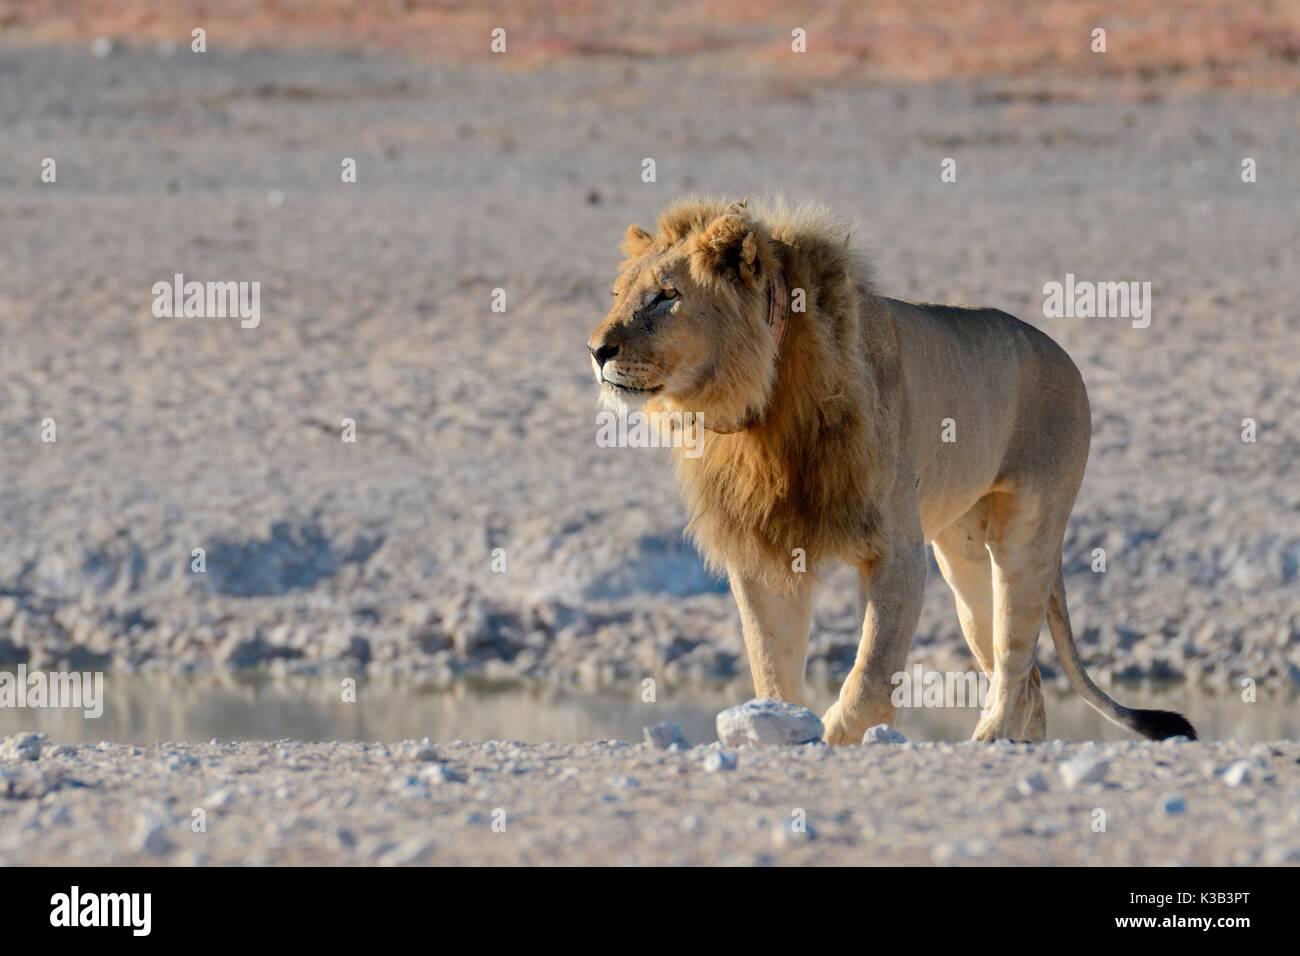 African lion (Panthera leo) at a waterhole, with tracking collar, Etosha Nationalpark, Namibia - Stock Image